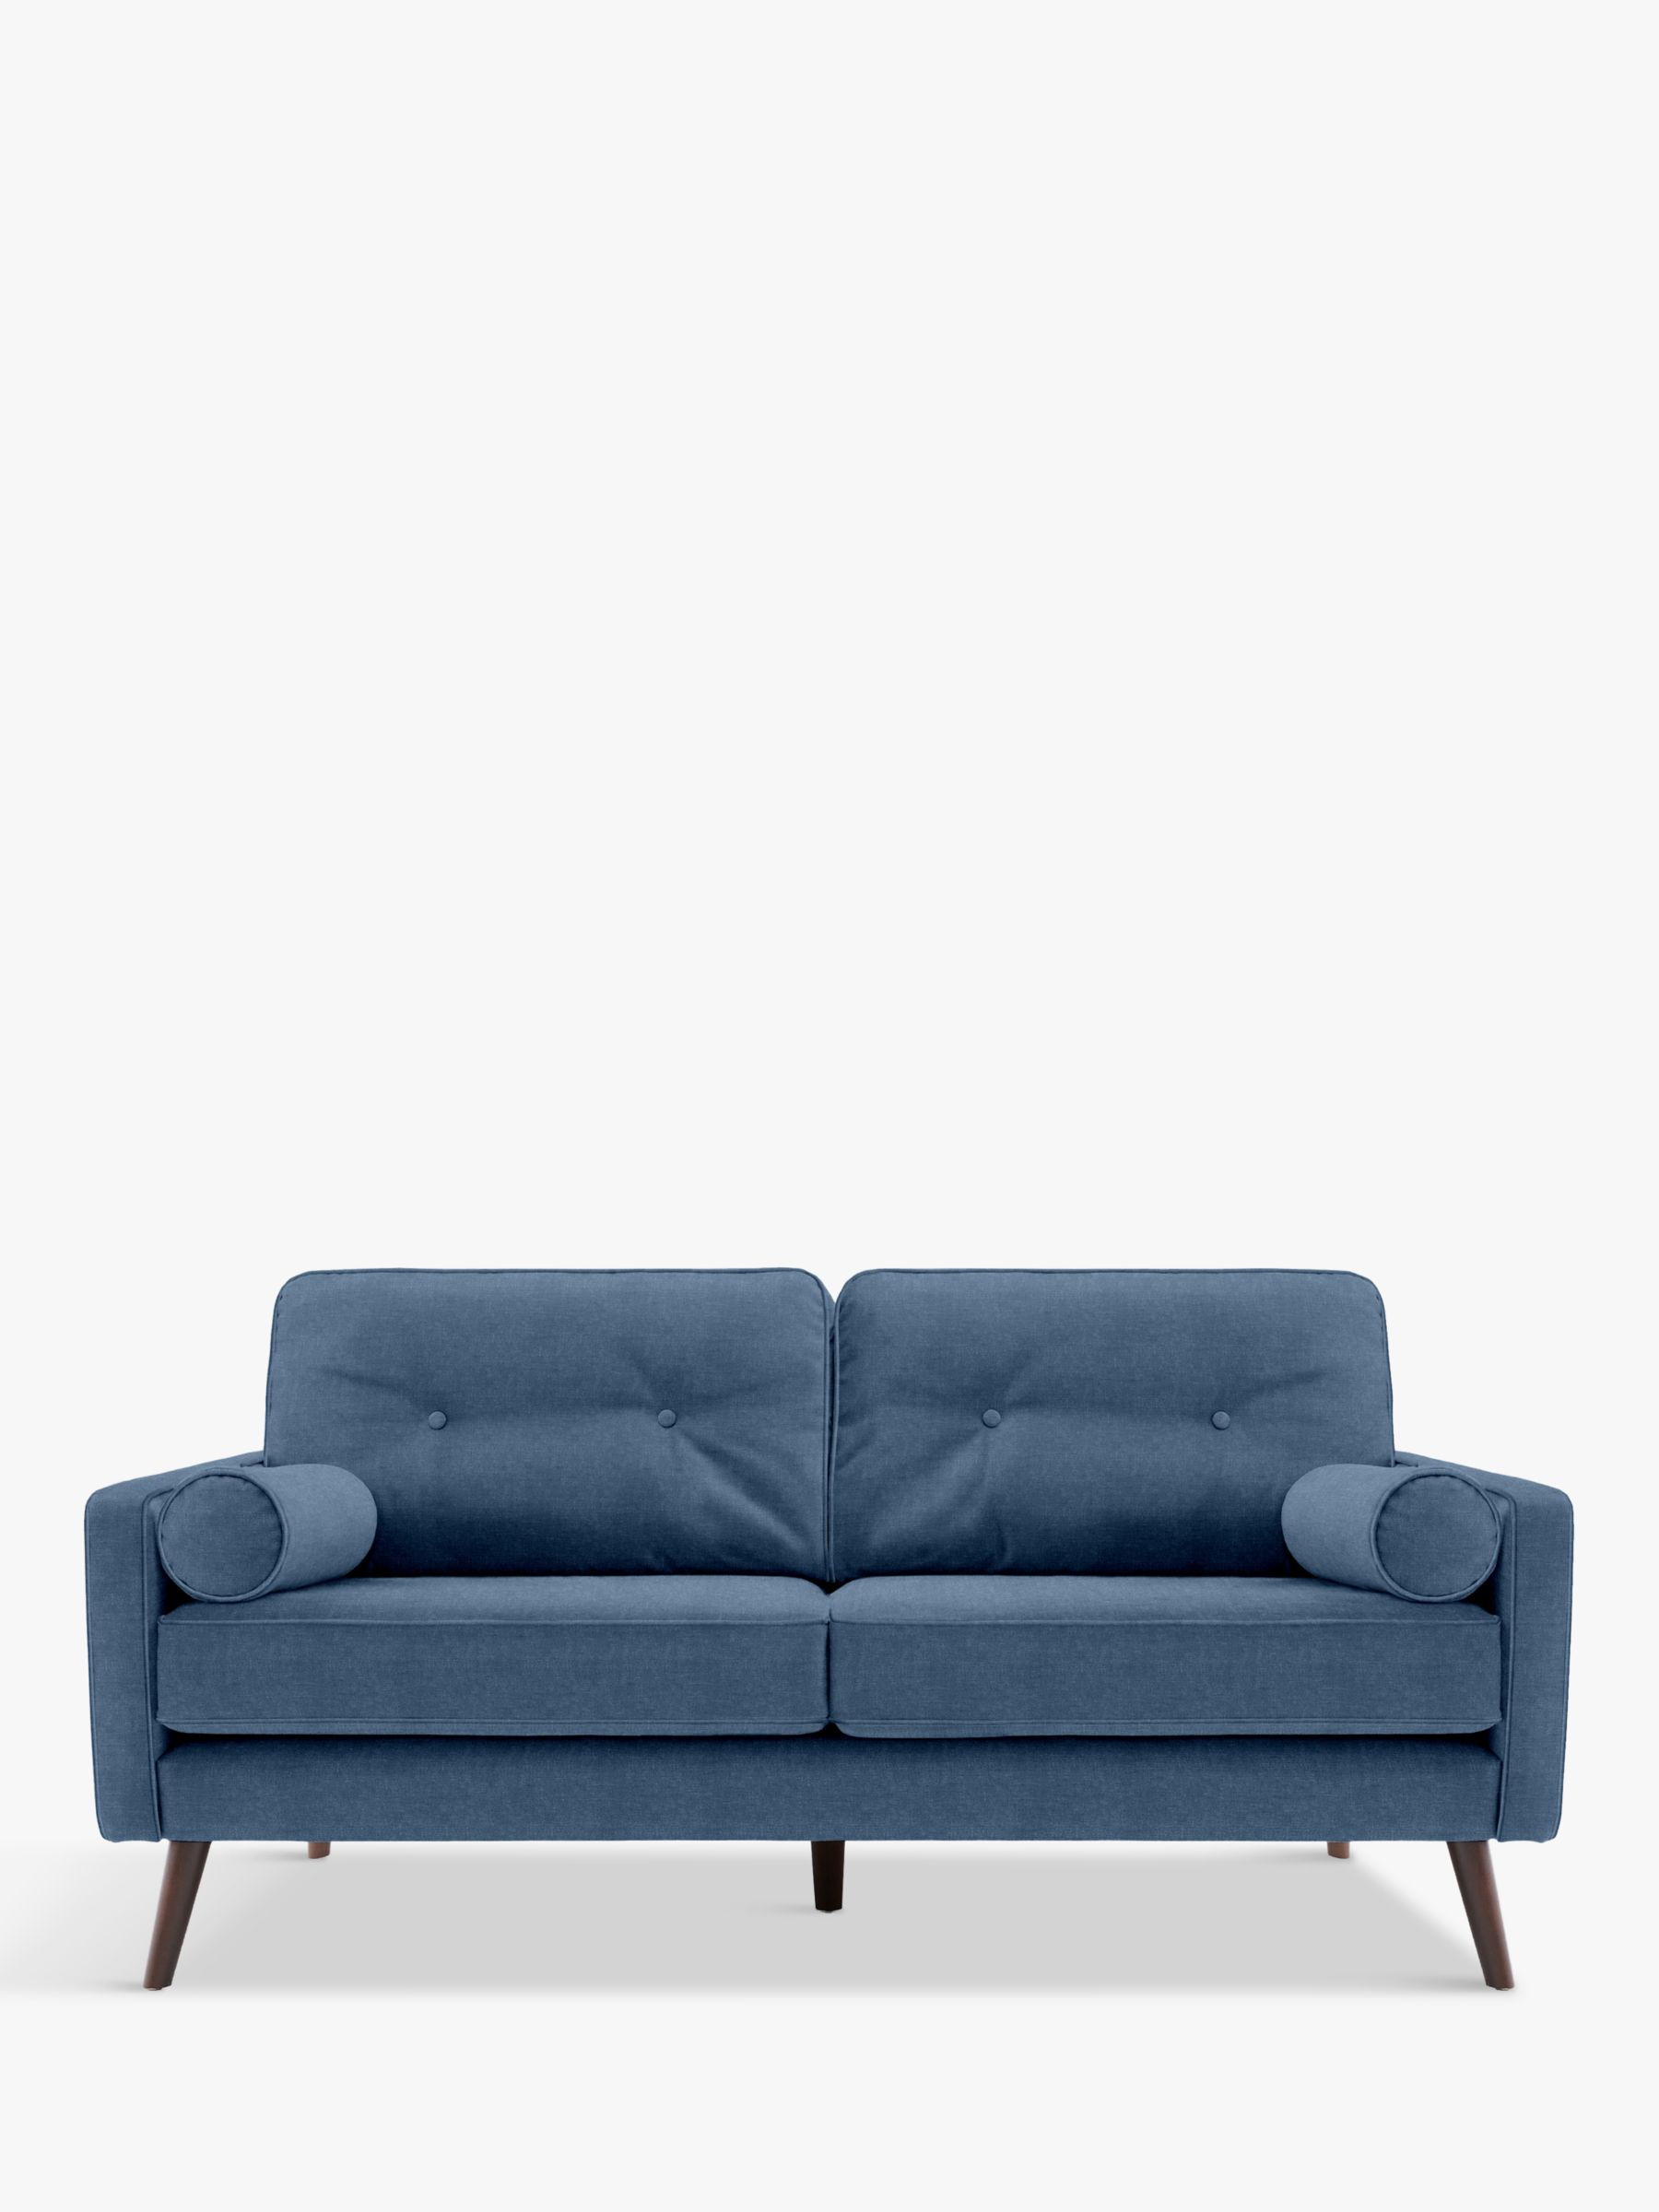 G Plan Vintage G Plan Vintage The Sixty Five Medium 2 Seater Sofa, Ash Leg, Deluxe Scuba Velvet